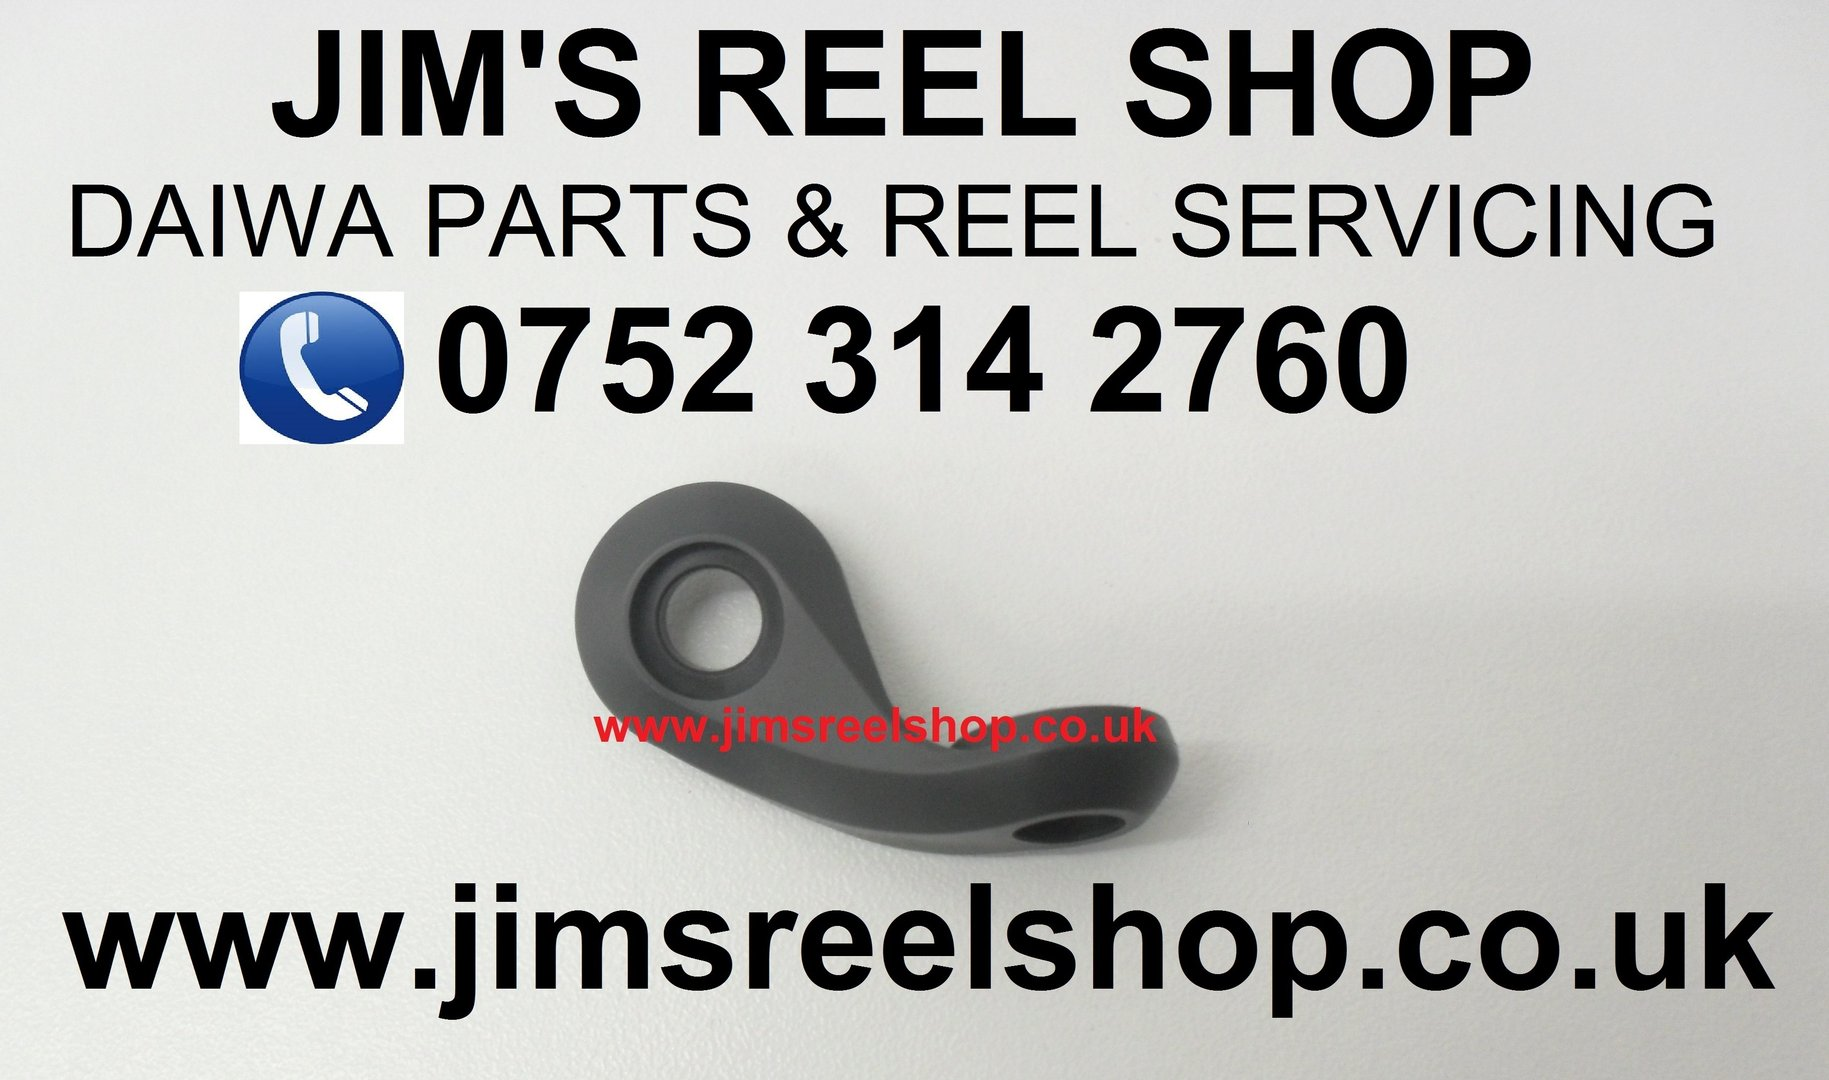 caab1c339e4 DAIWA BASIA 45KYOGOI GREY BAIL ARM #G17-8403 - Jim's Reel Shop